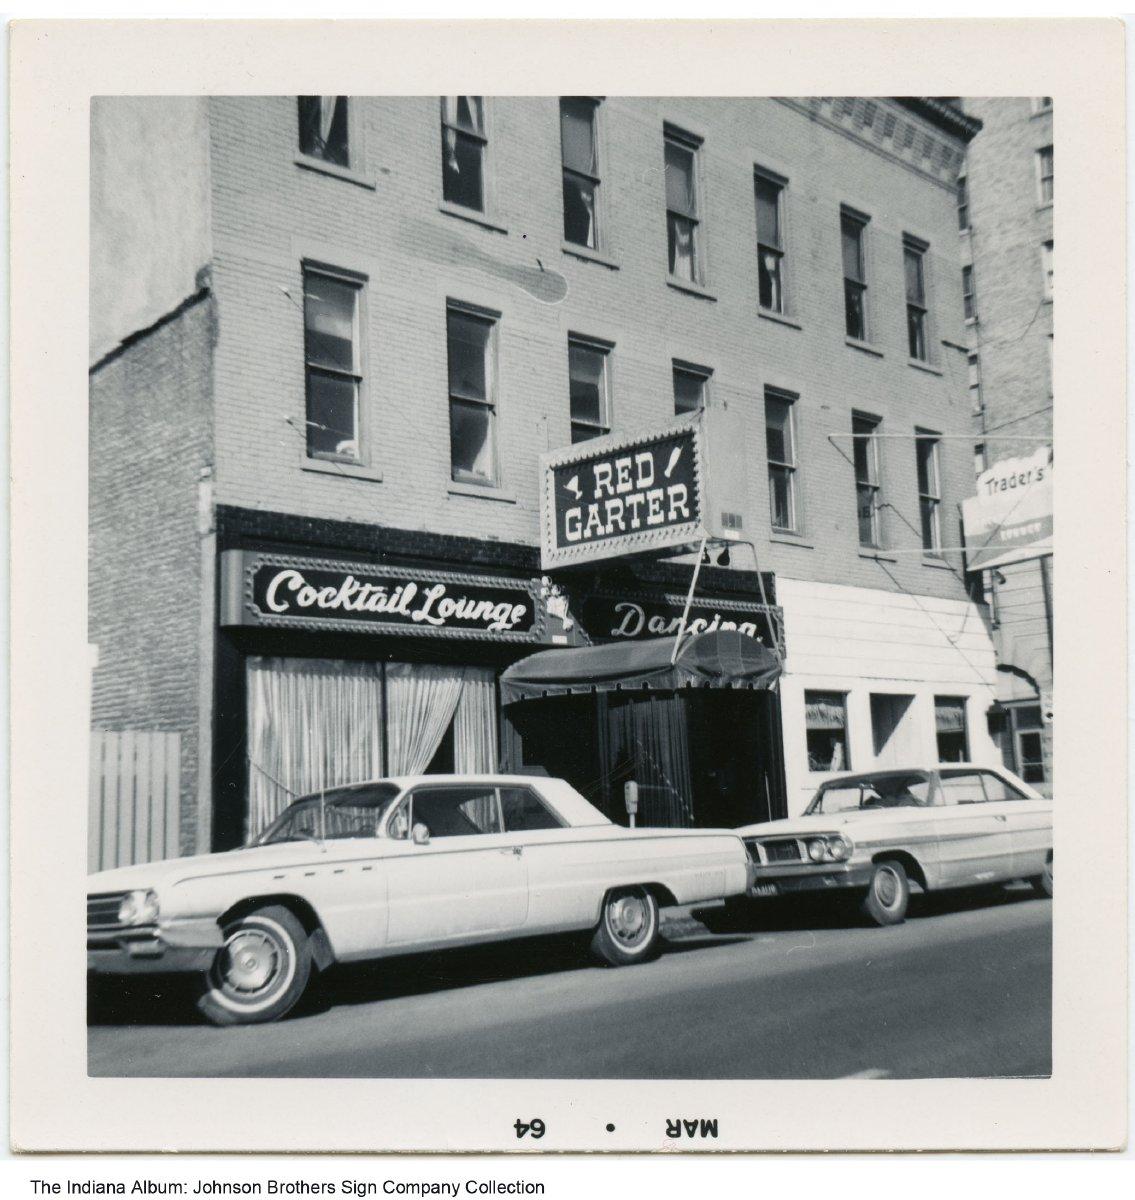 Red Garter Cocktail Lounge Fort Wayne Indiana 1965